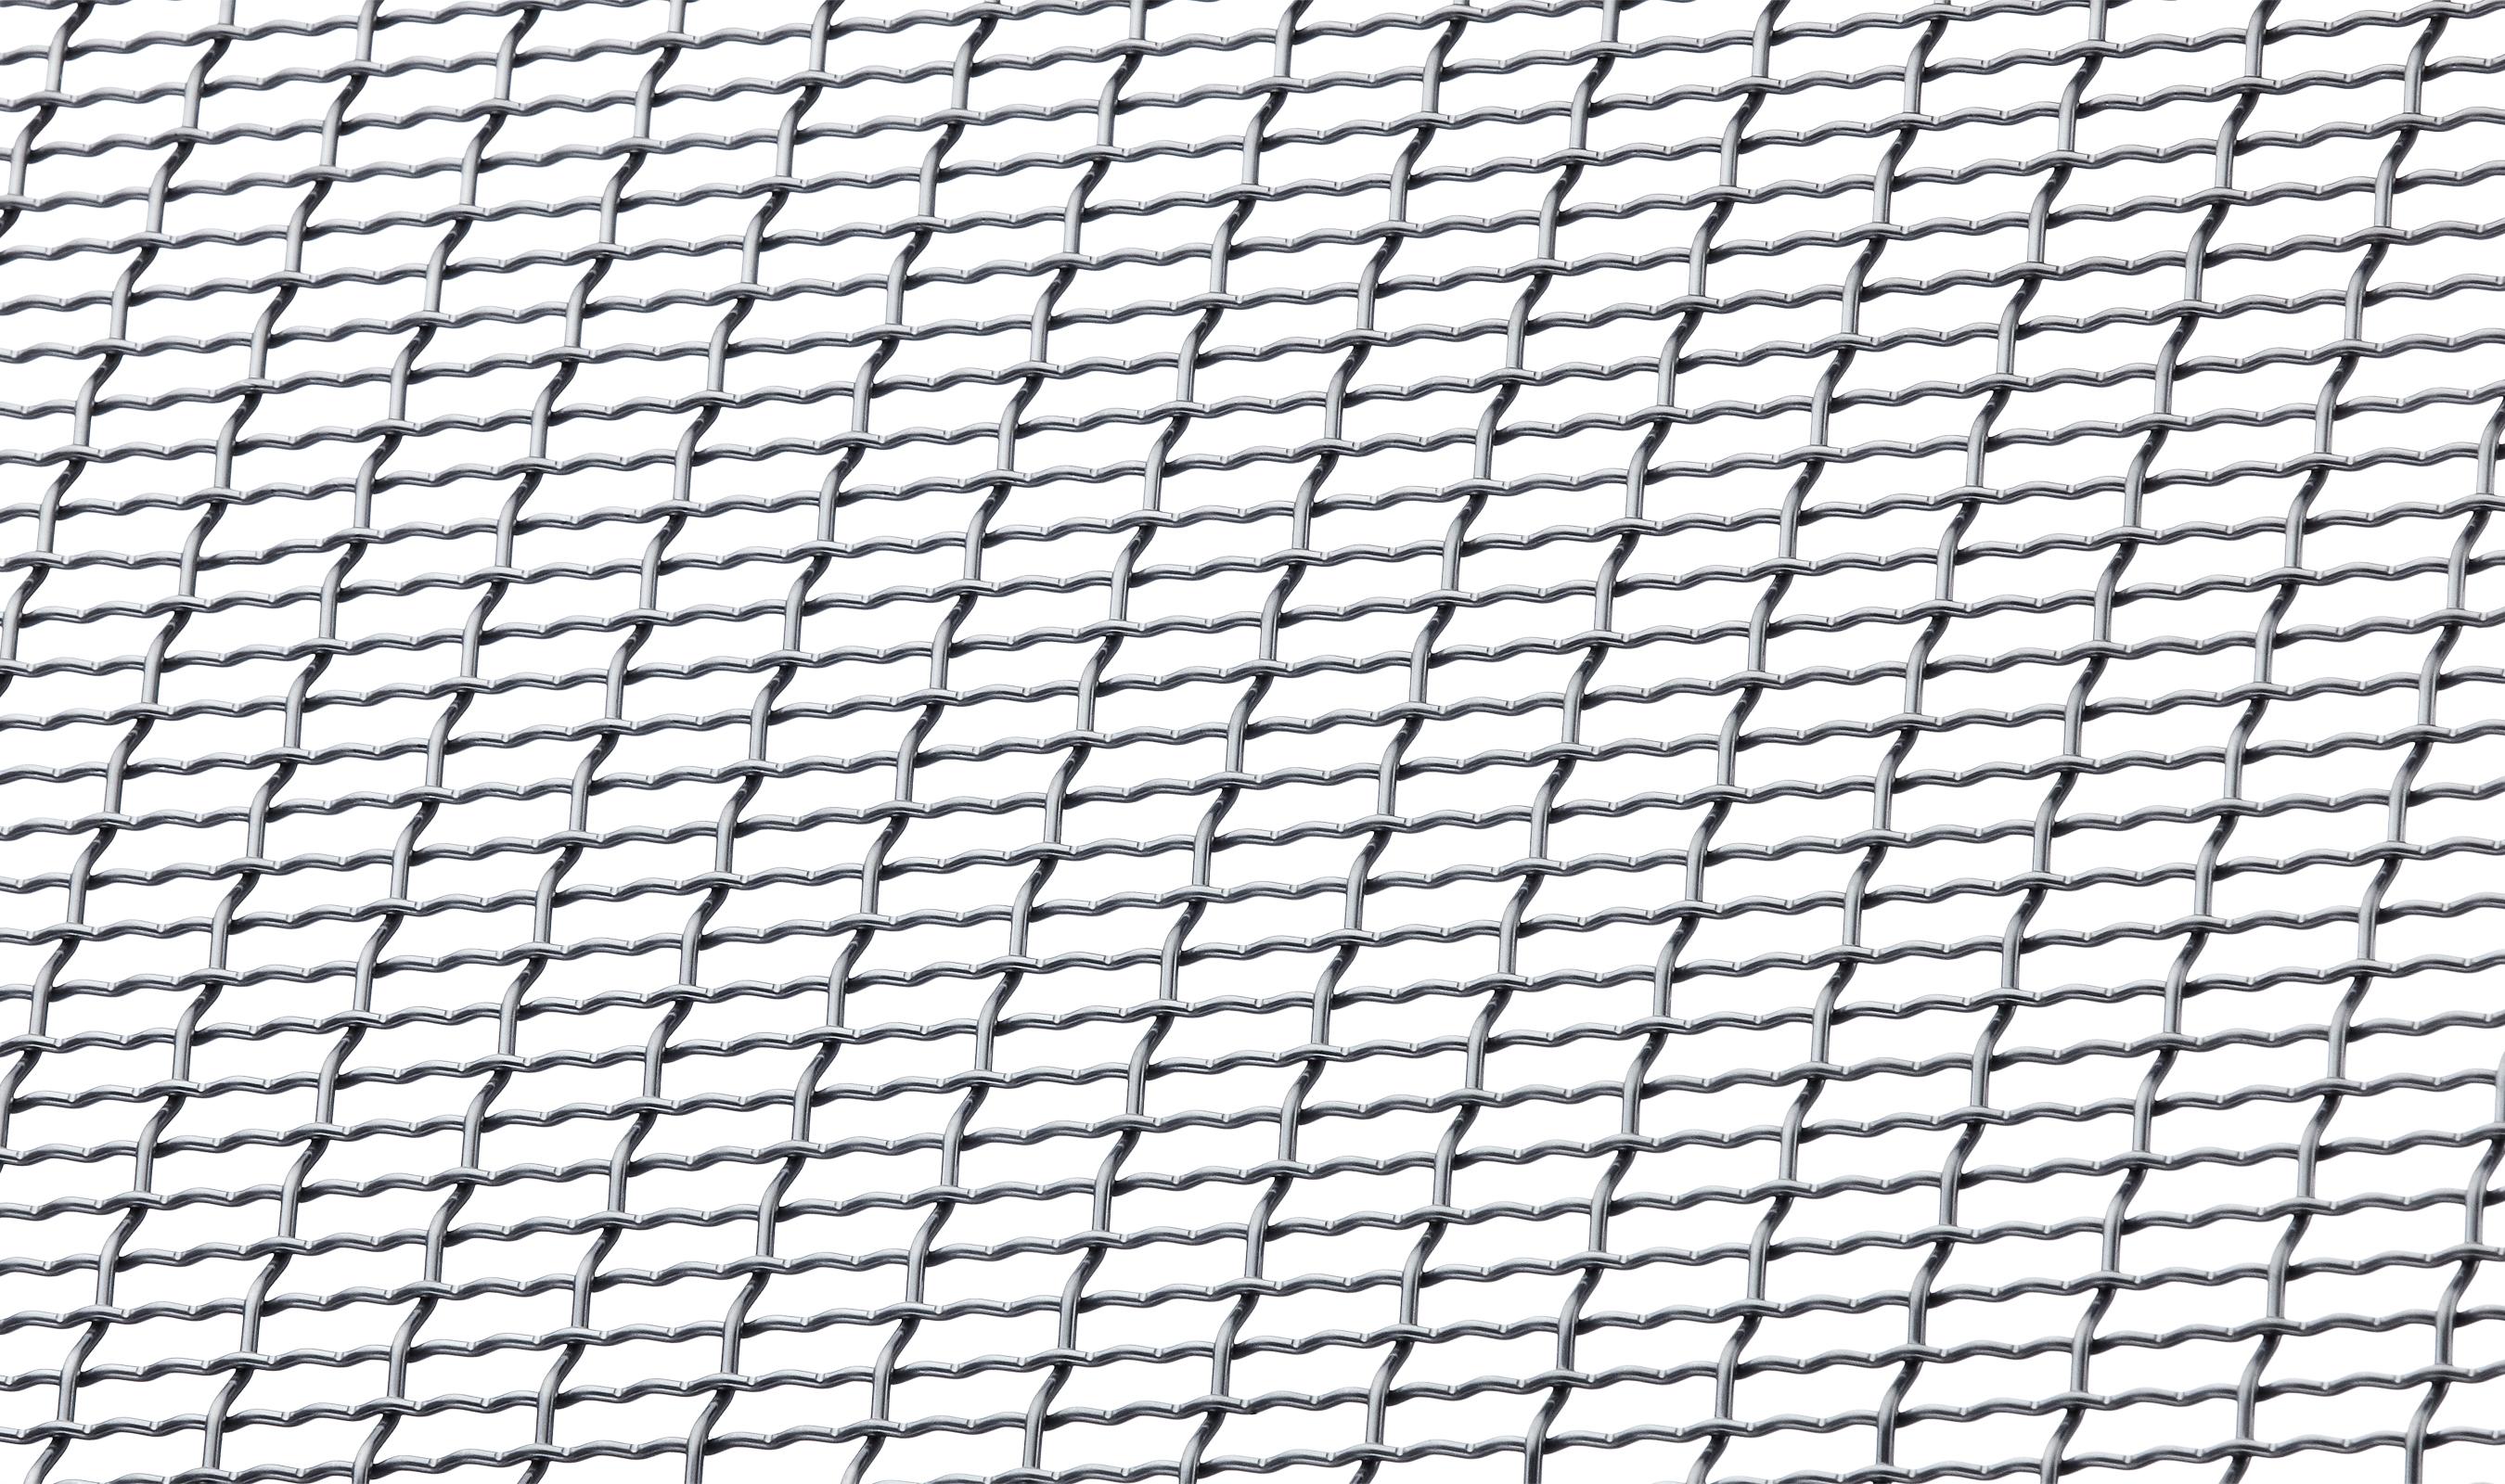 IPZ-33 Architectural woven wire mesh